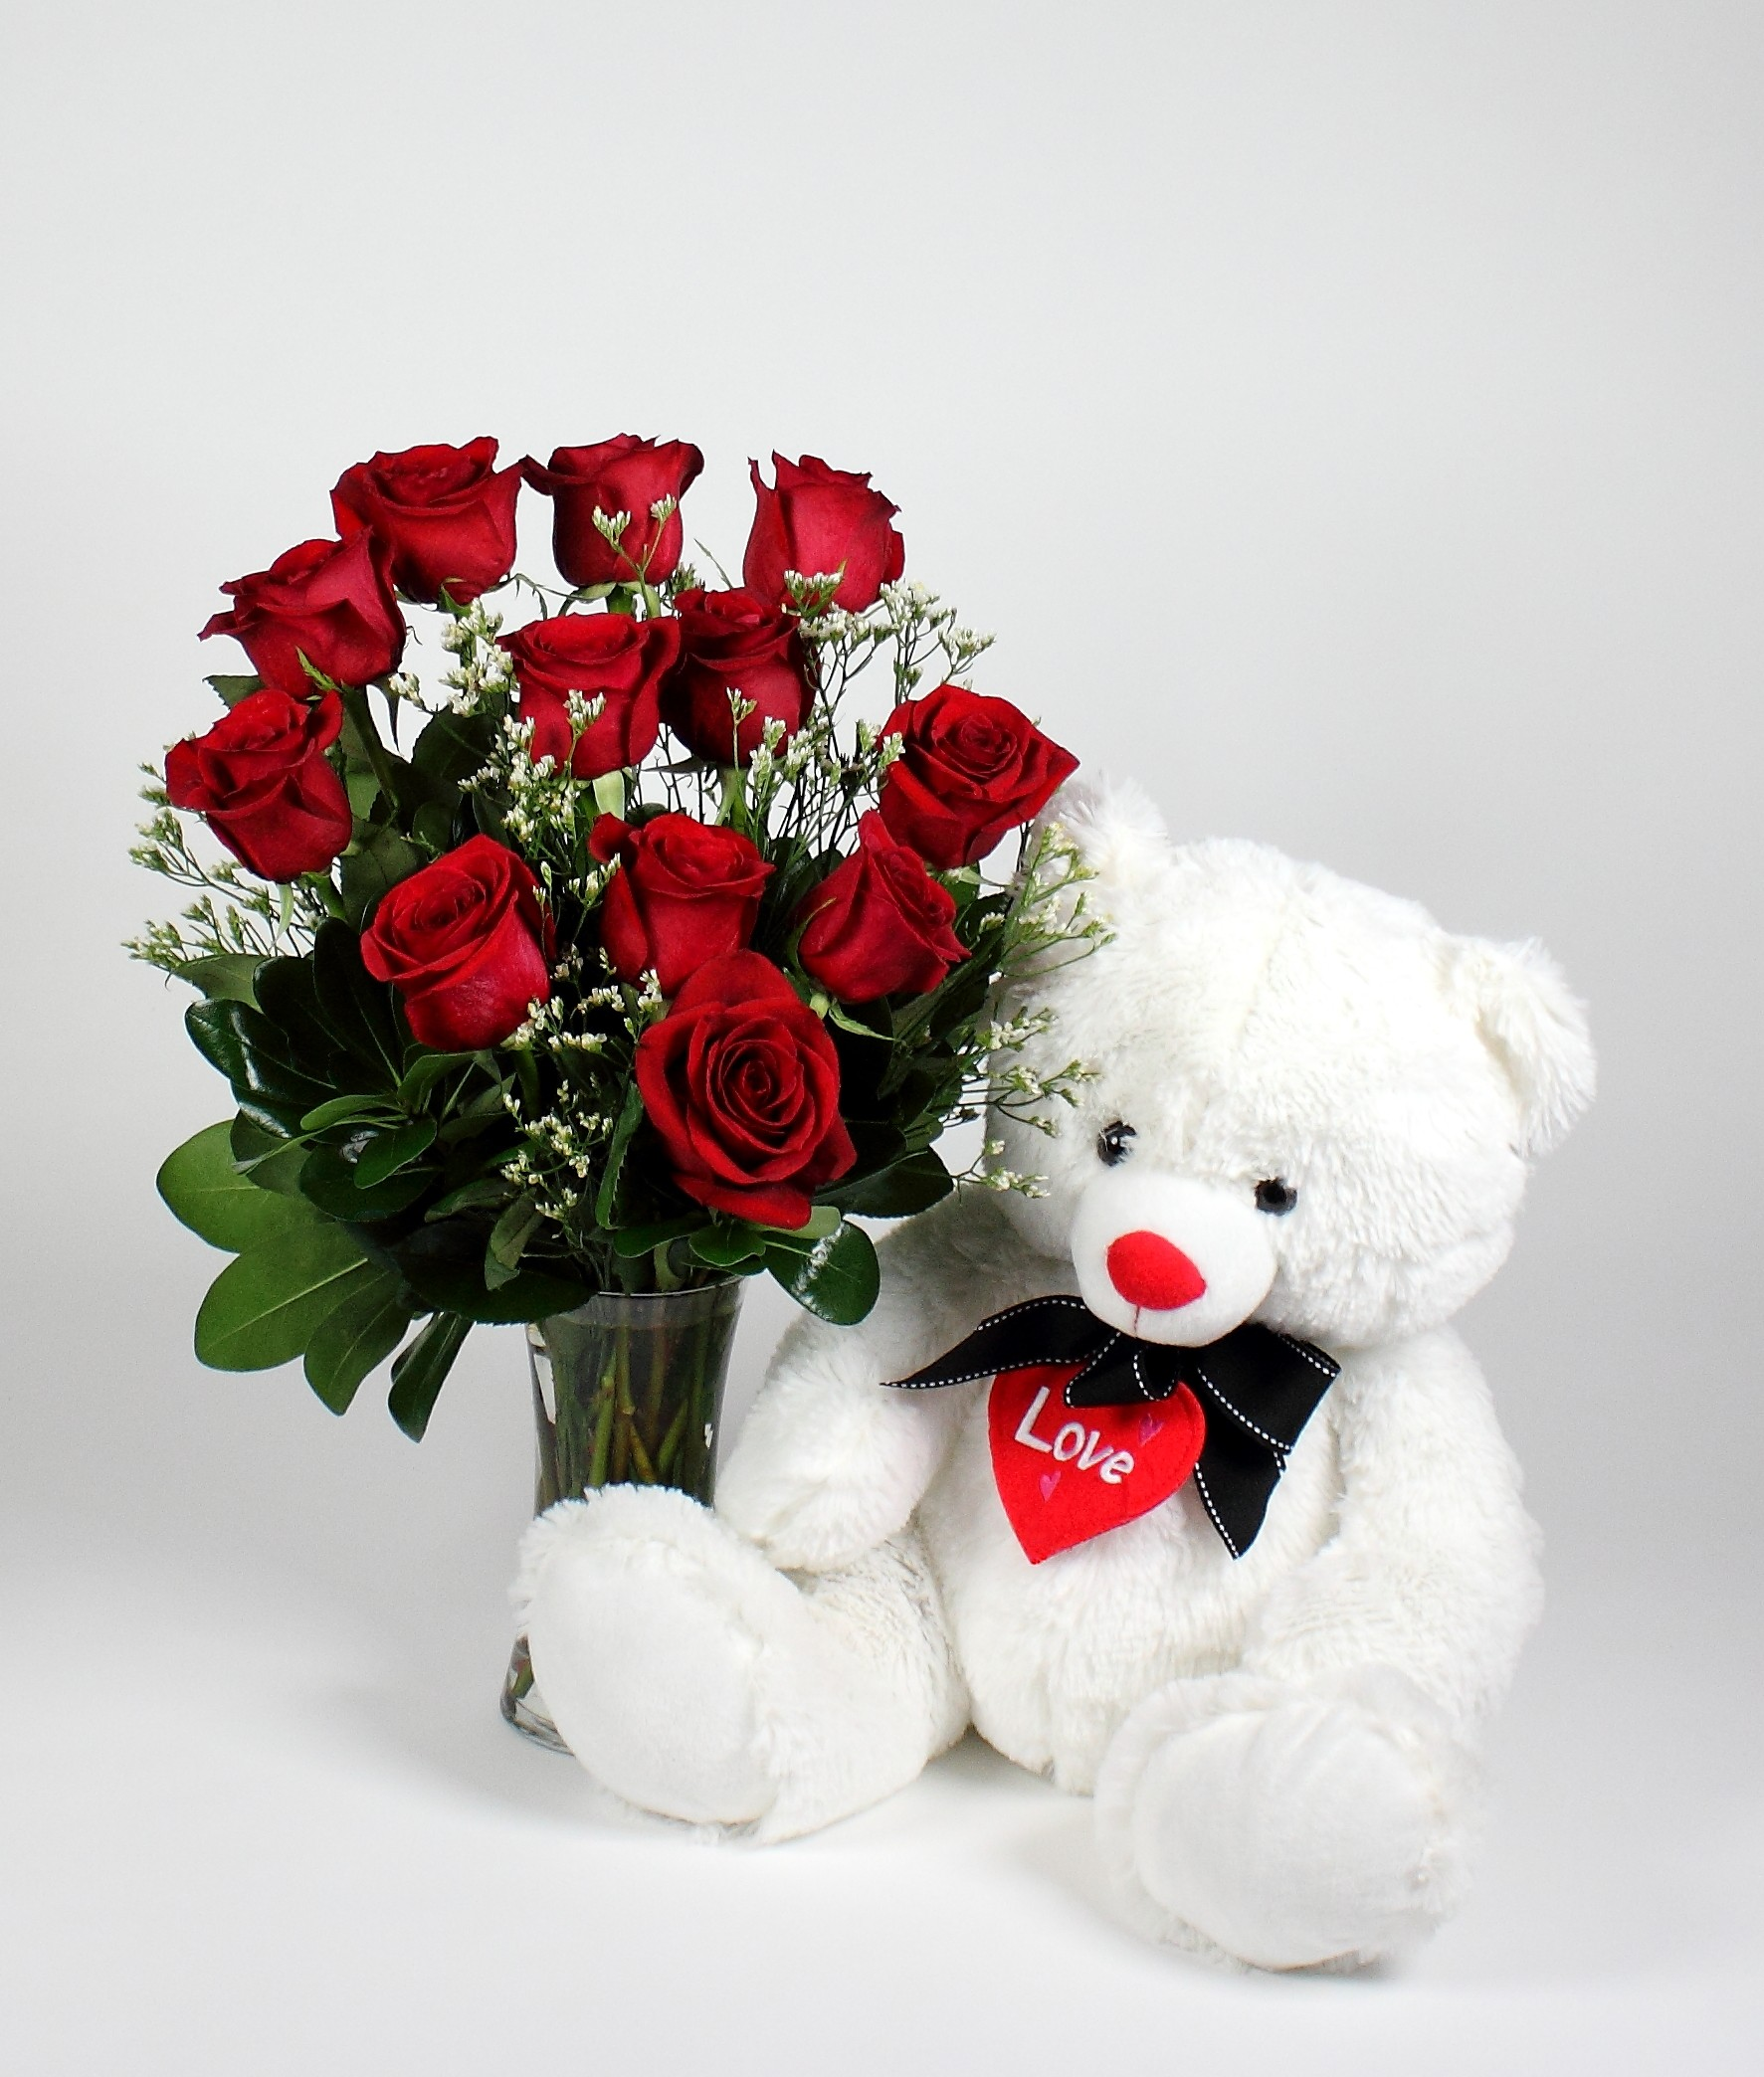 valentines-rose-05.jpg